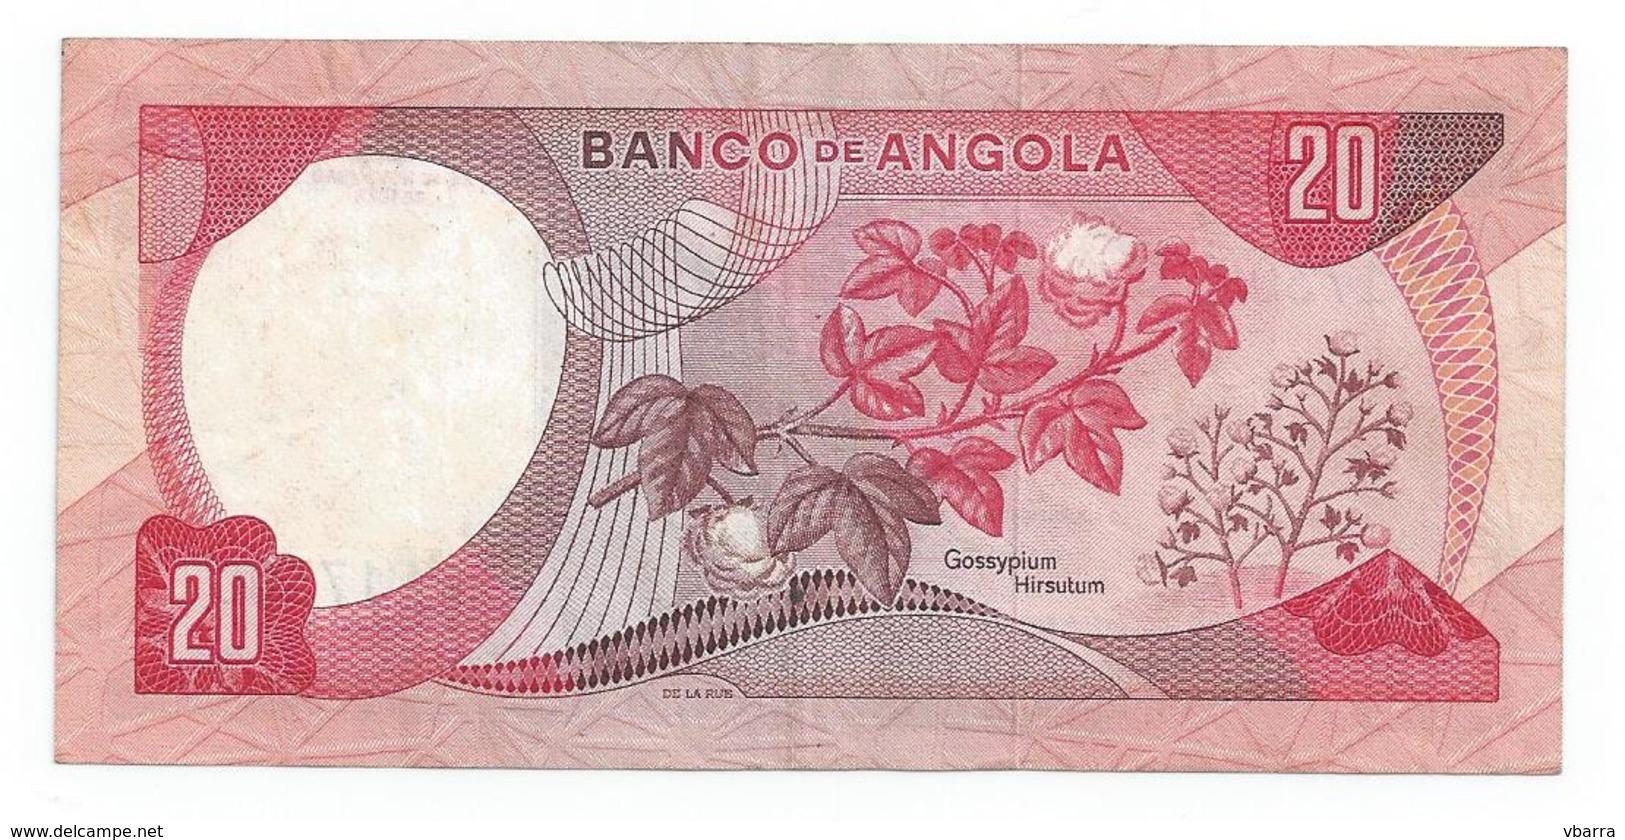 Bank Of Angola (colonial Period) 20 Escudos - Effigy Marechal Carmona - 1972 Banknote Billet De Banque Billete De Banco - Angola